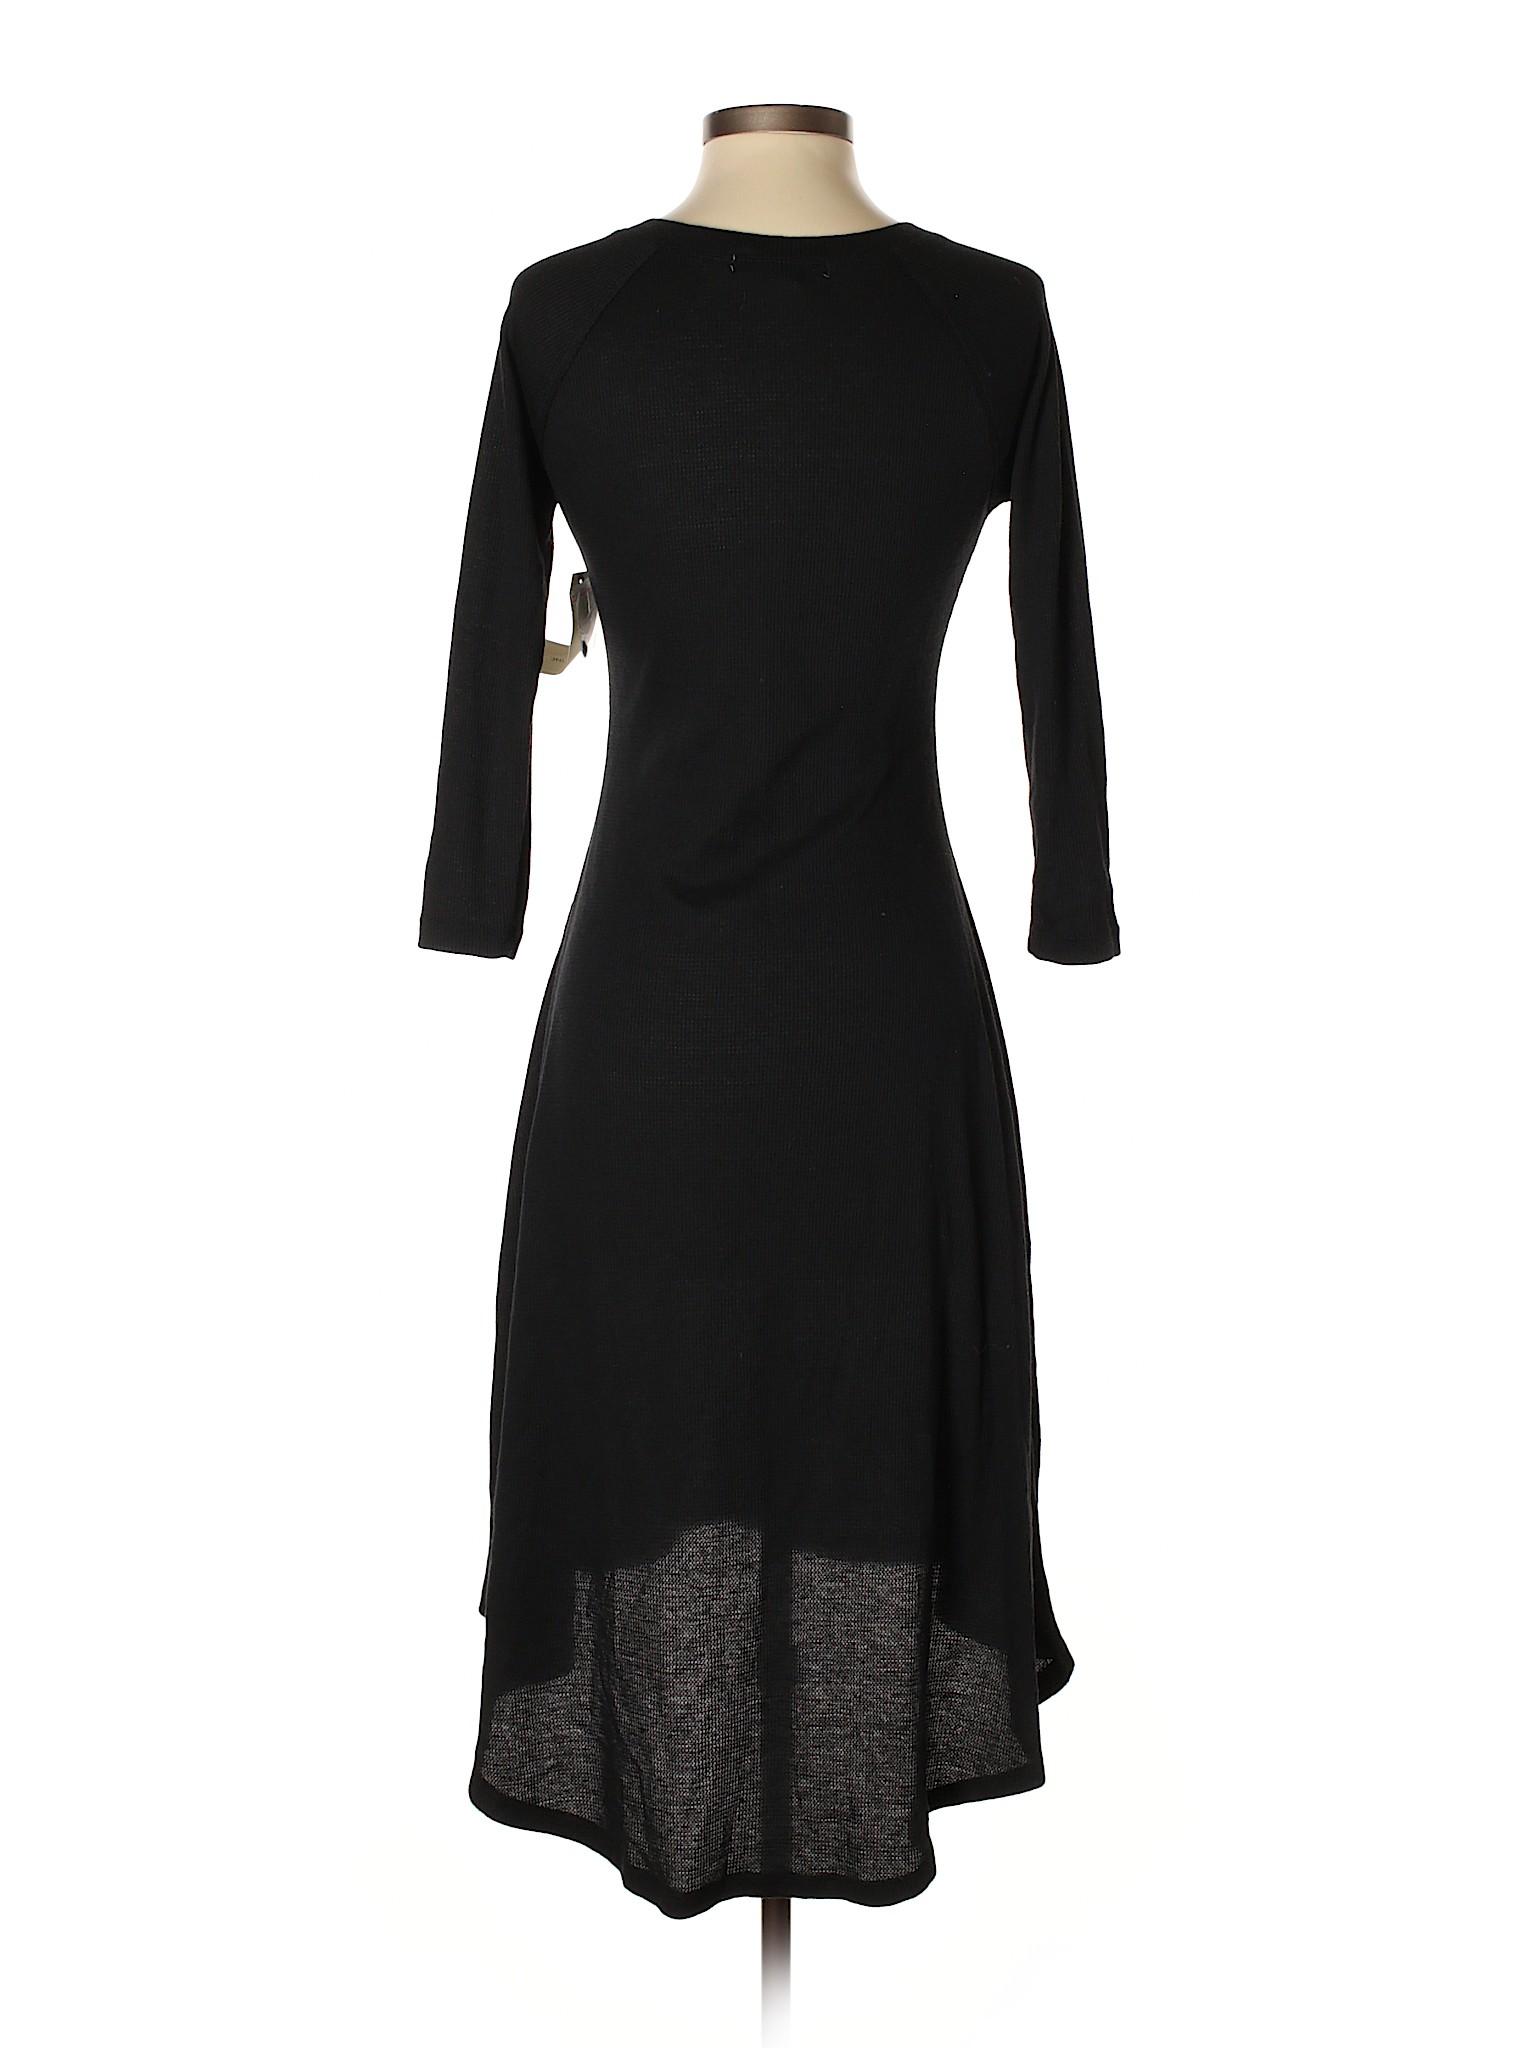 Levine Casual winter Boutique Dress Adam 4UXq4WOS